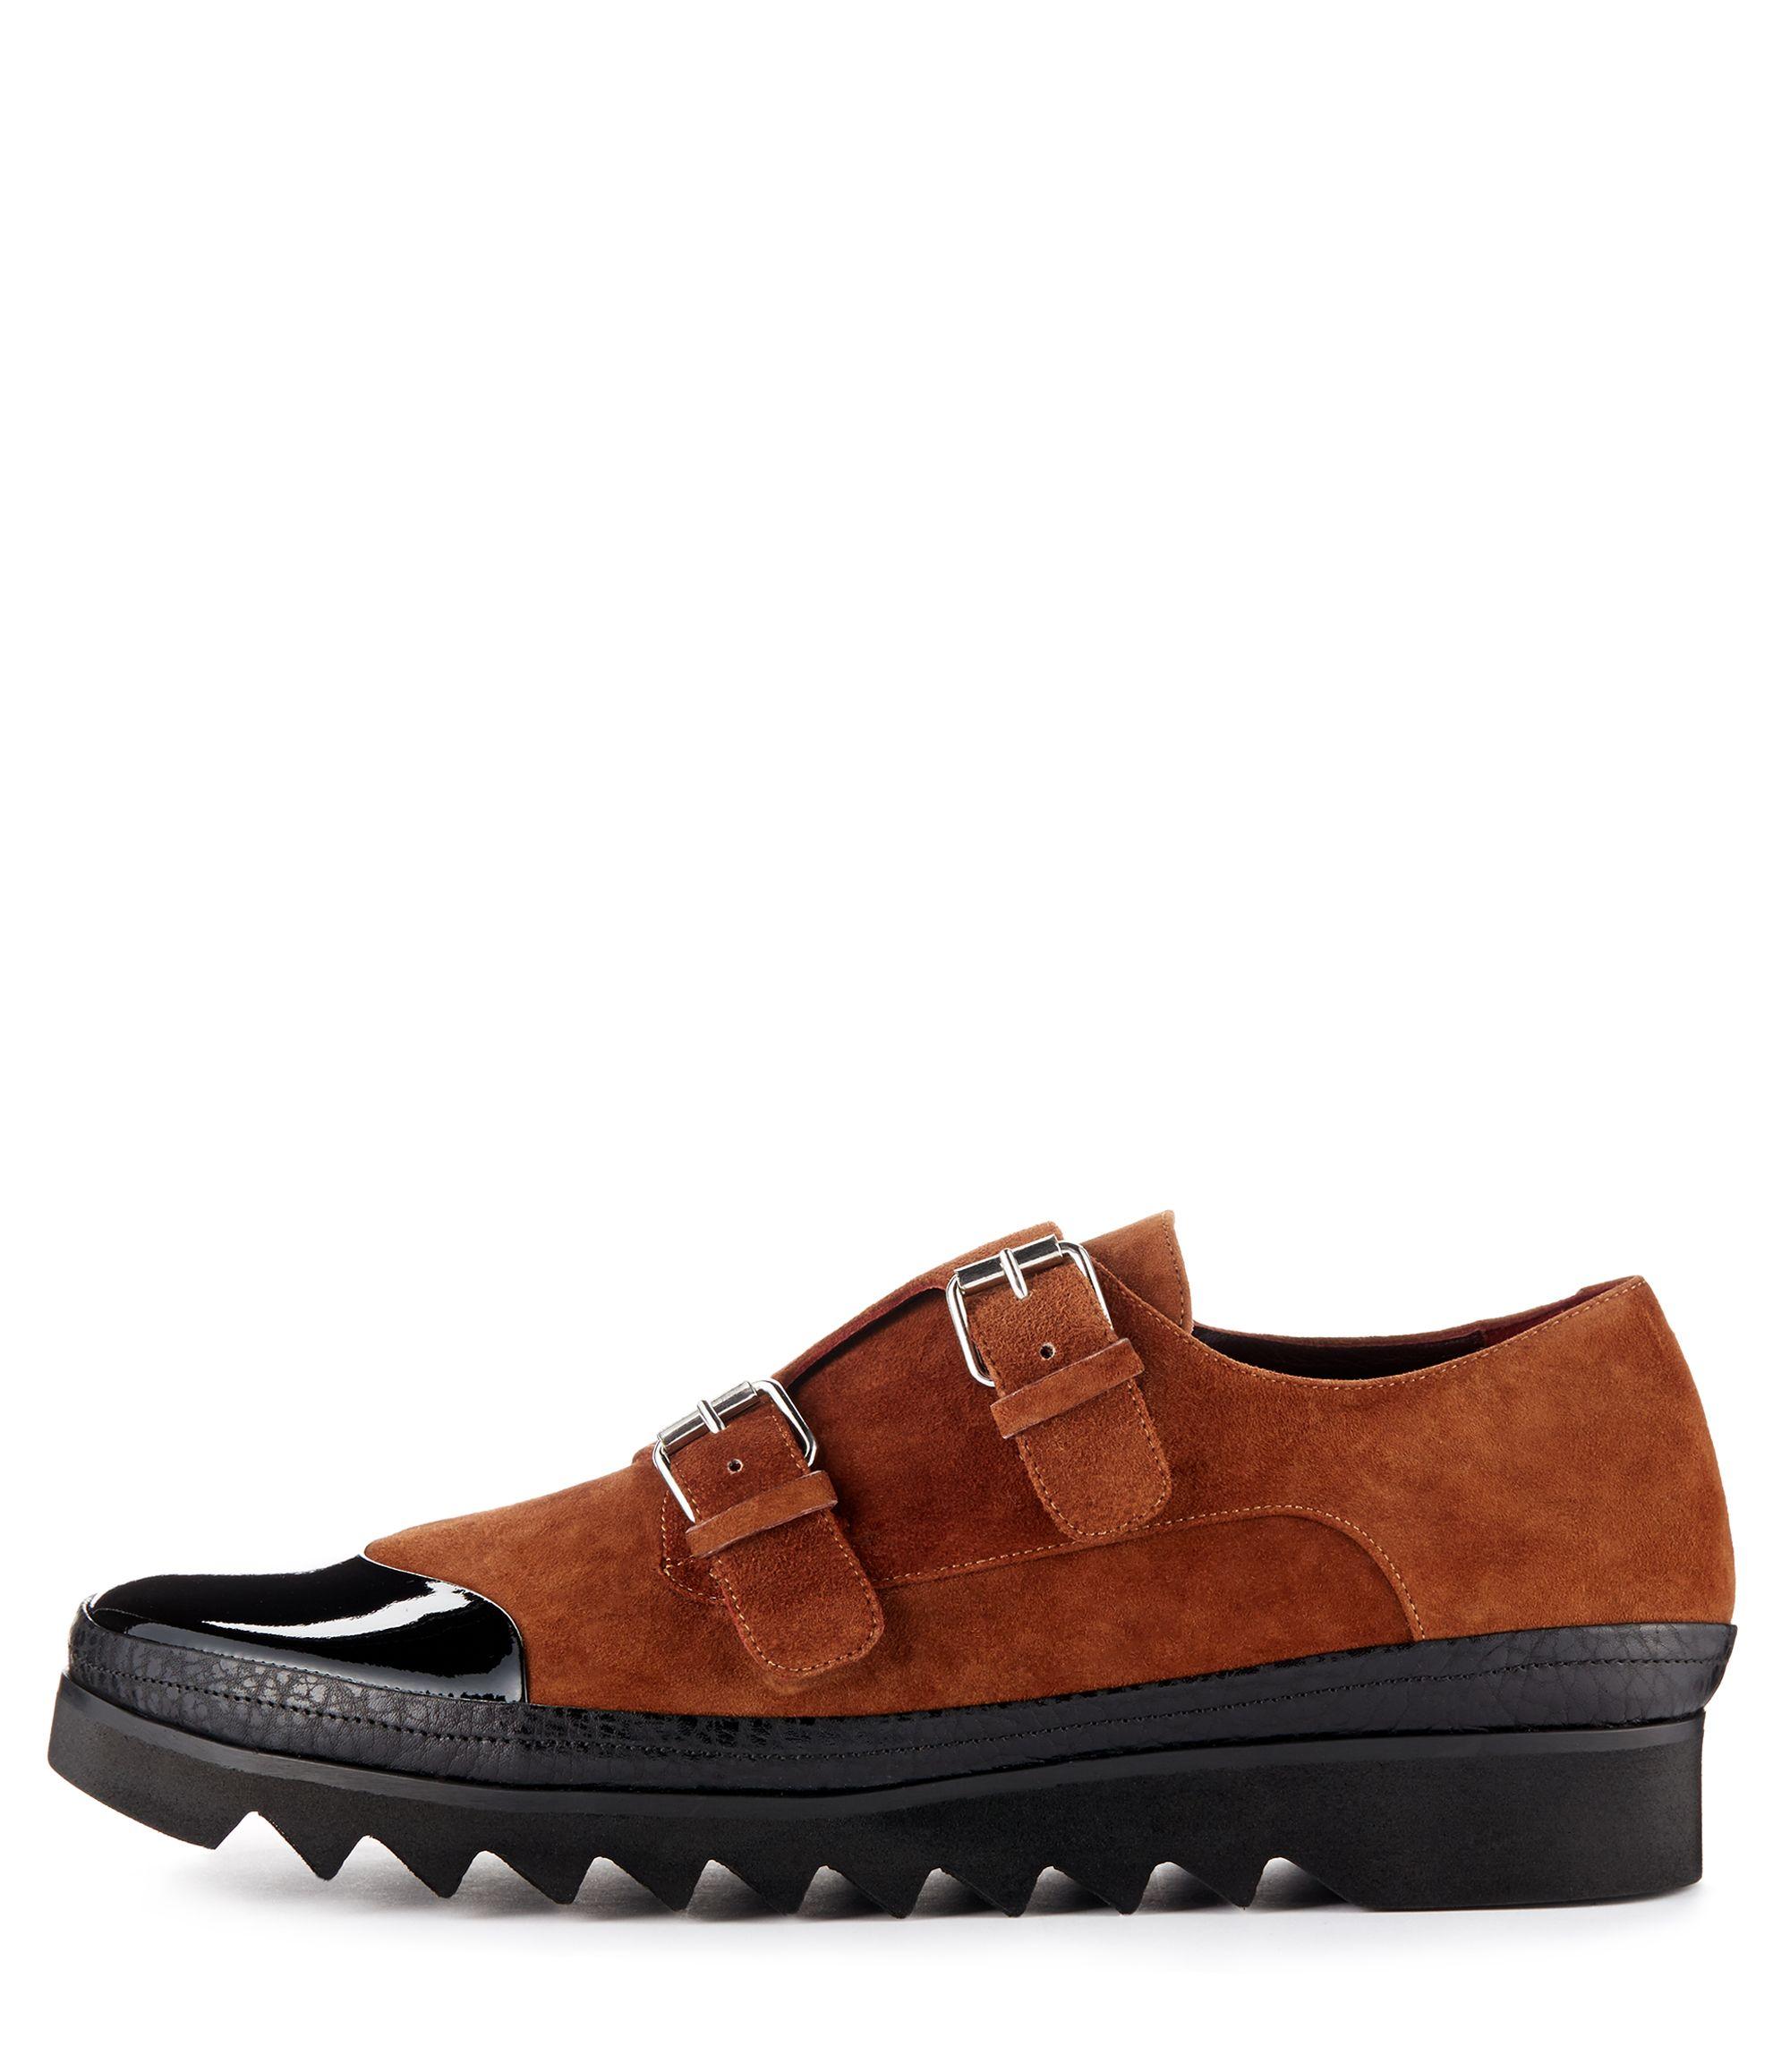 Treads Monk Shoes Cognac/Black #AW1415